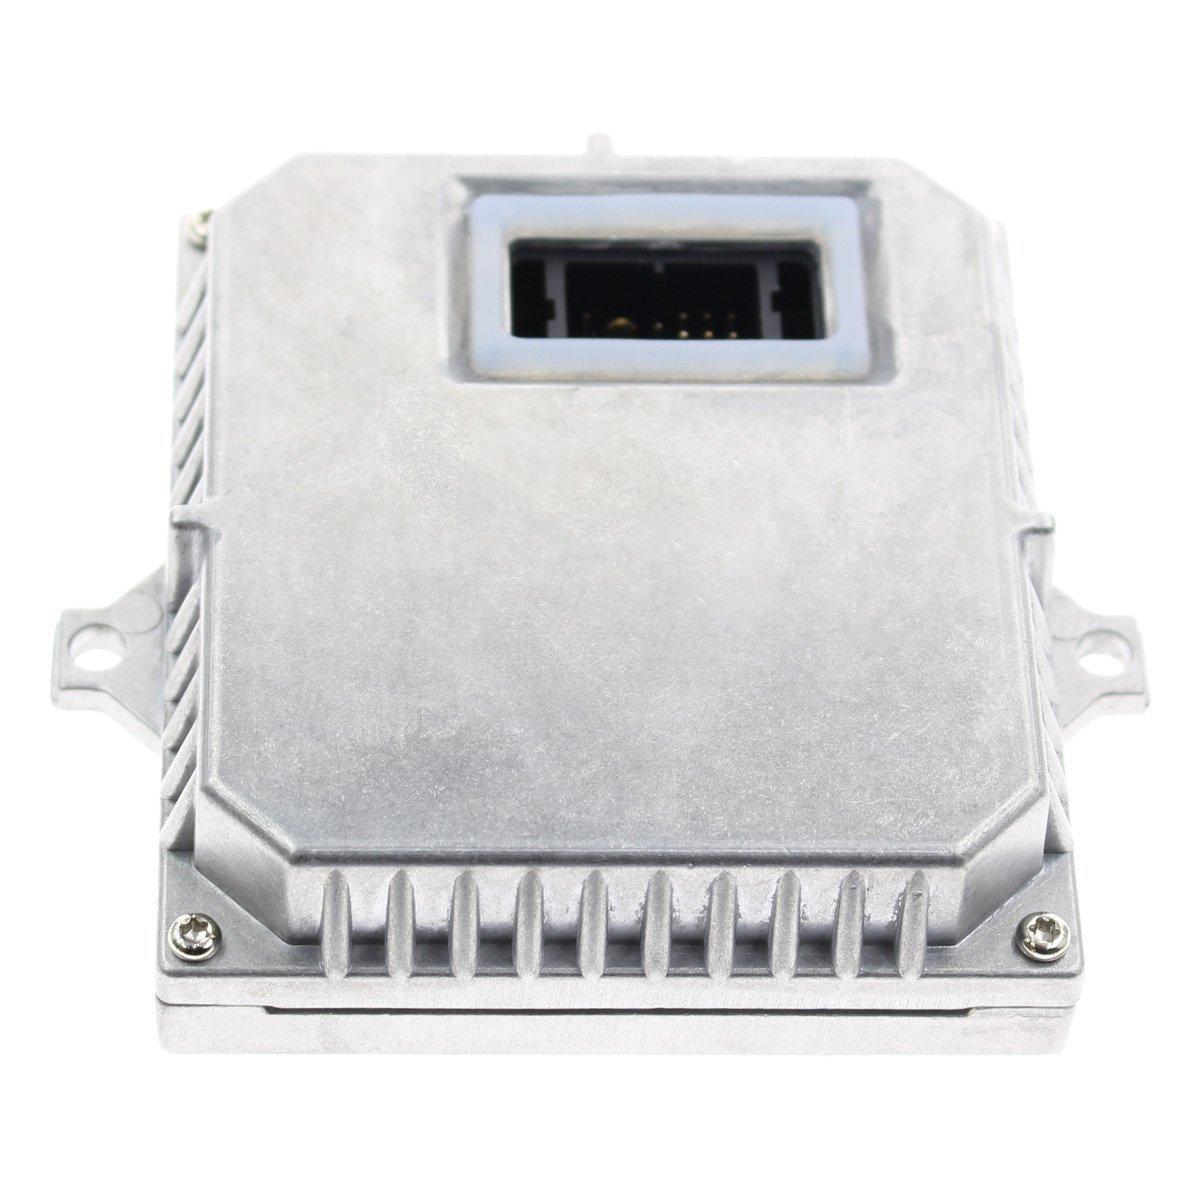 Wisamic Module de commande de phare pour phare de ballast x/énon HID pour AL 1307329090 Module de commande pour phare de ballast x/énon HID 1 307 329 087